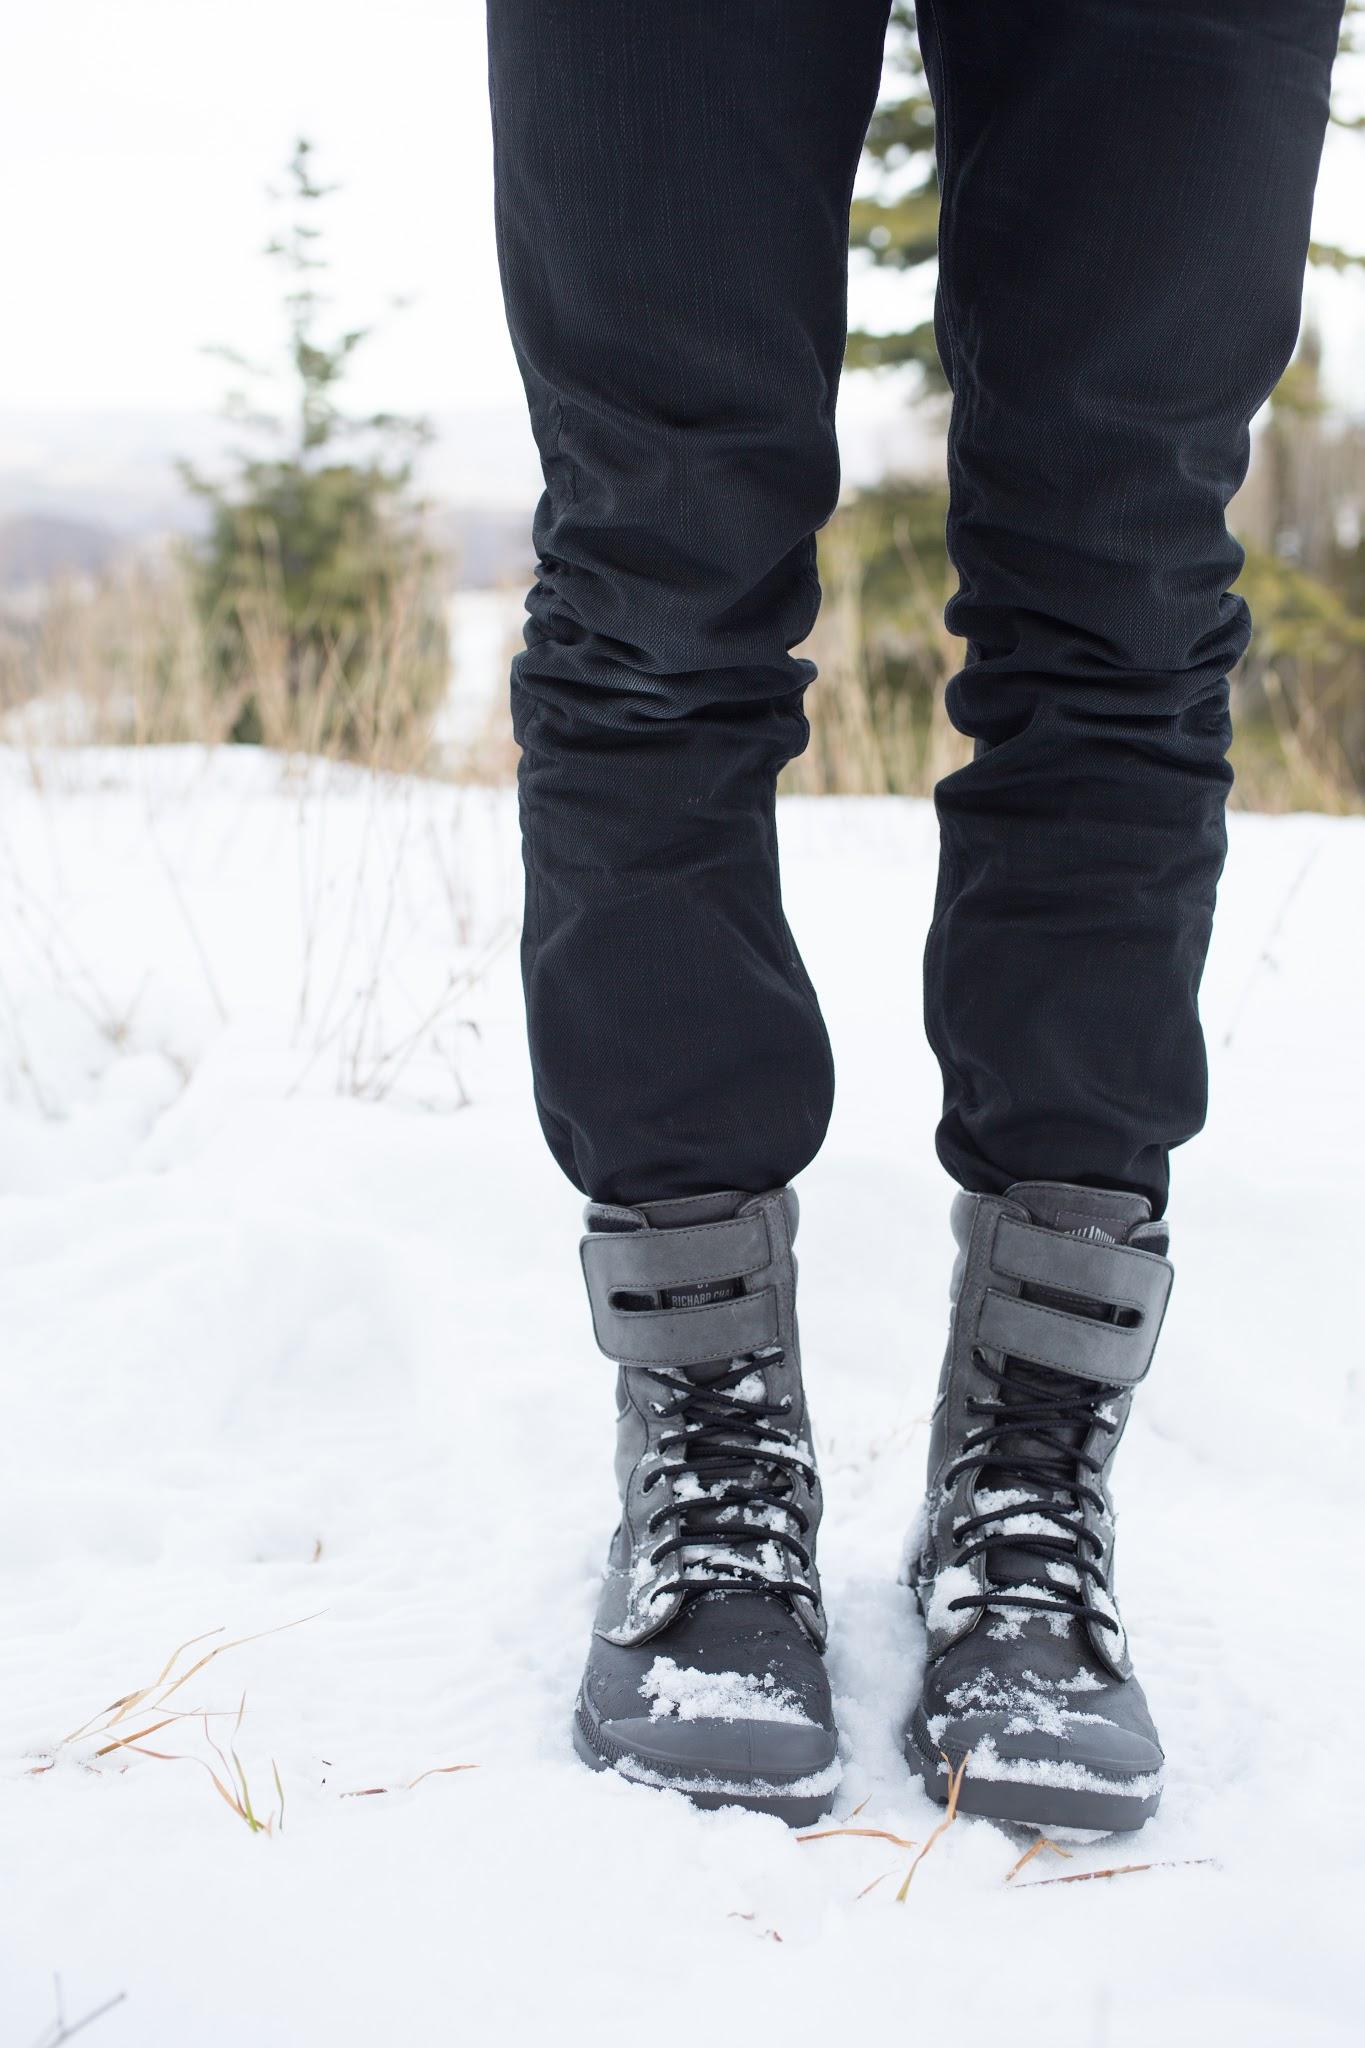 Palladium Boots in the Snow